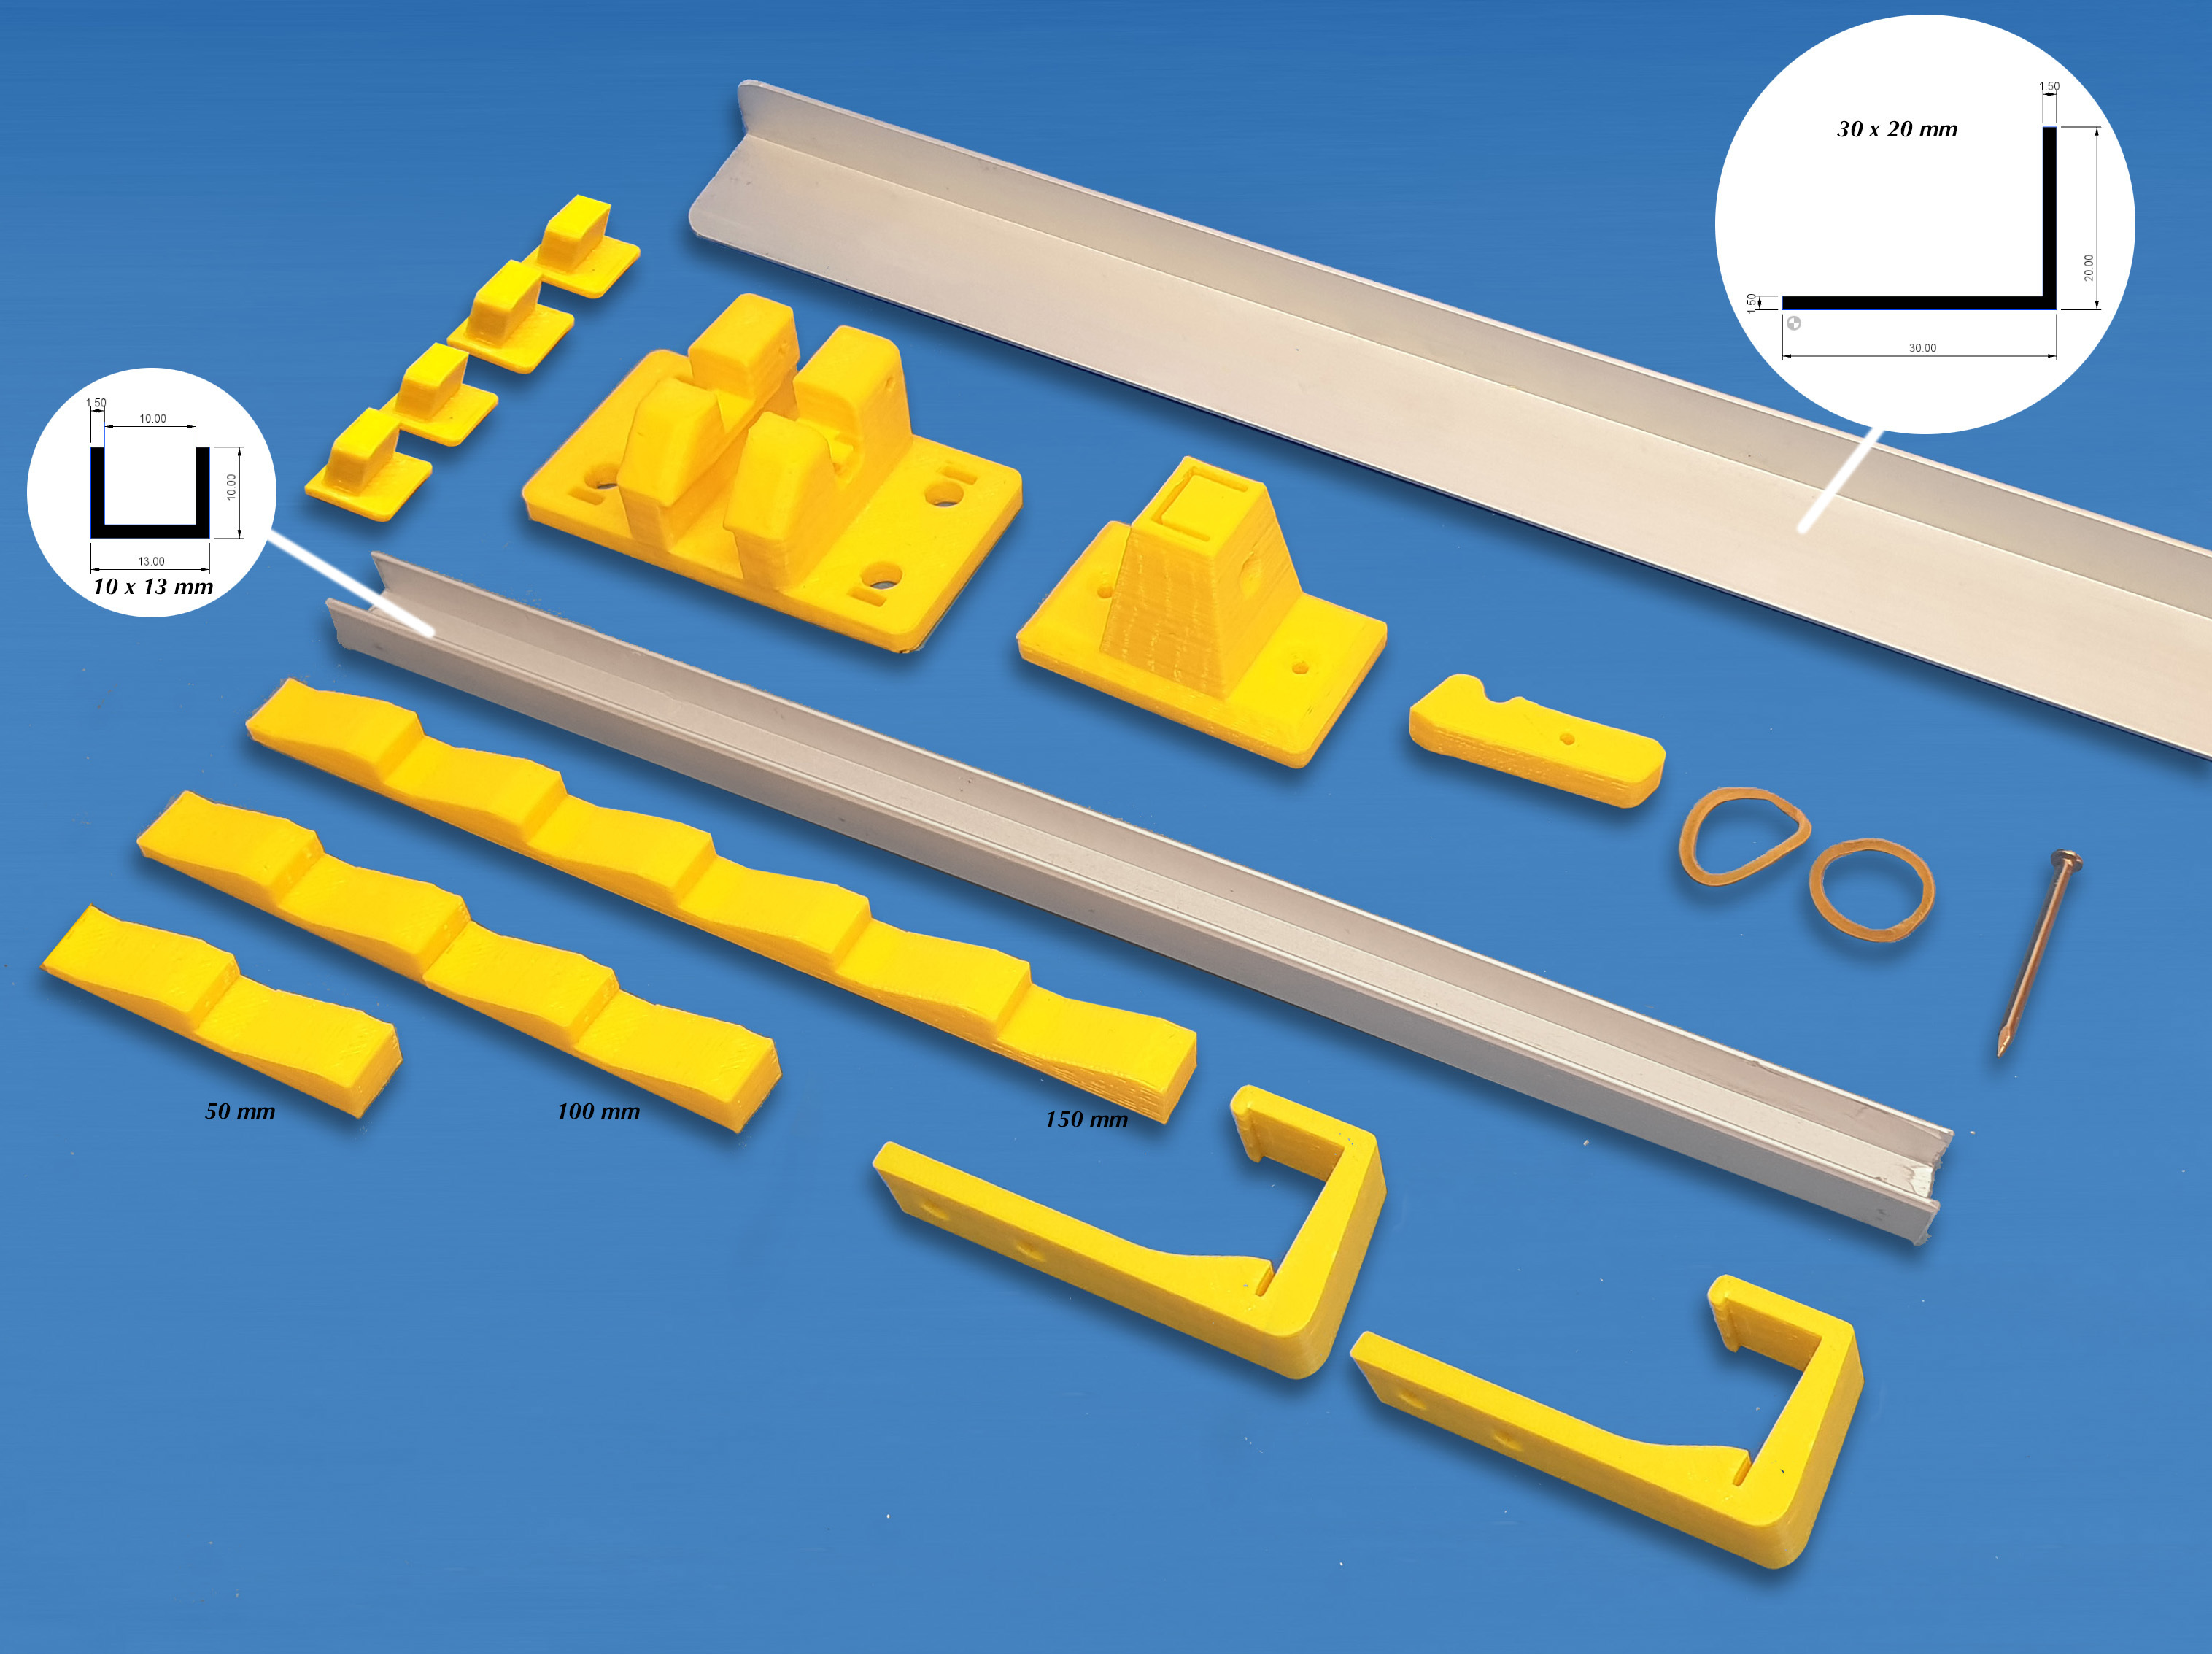 Foto4.jpg Download free STL file Laser Lifting Feet • 3D printing template, dancingchicken